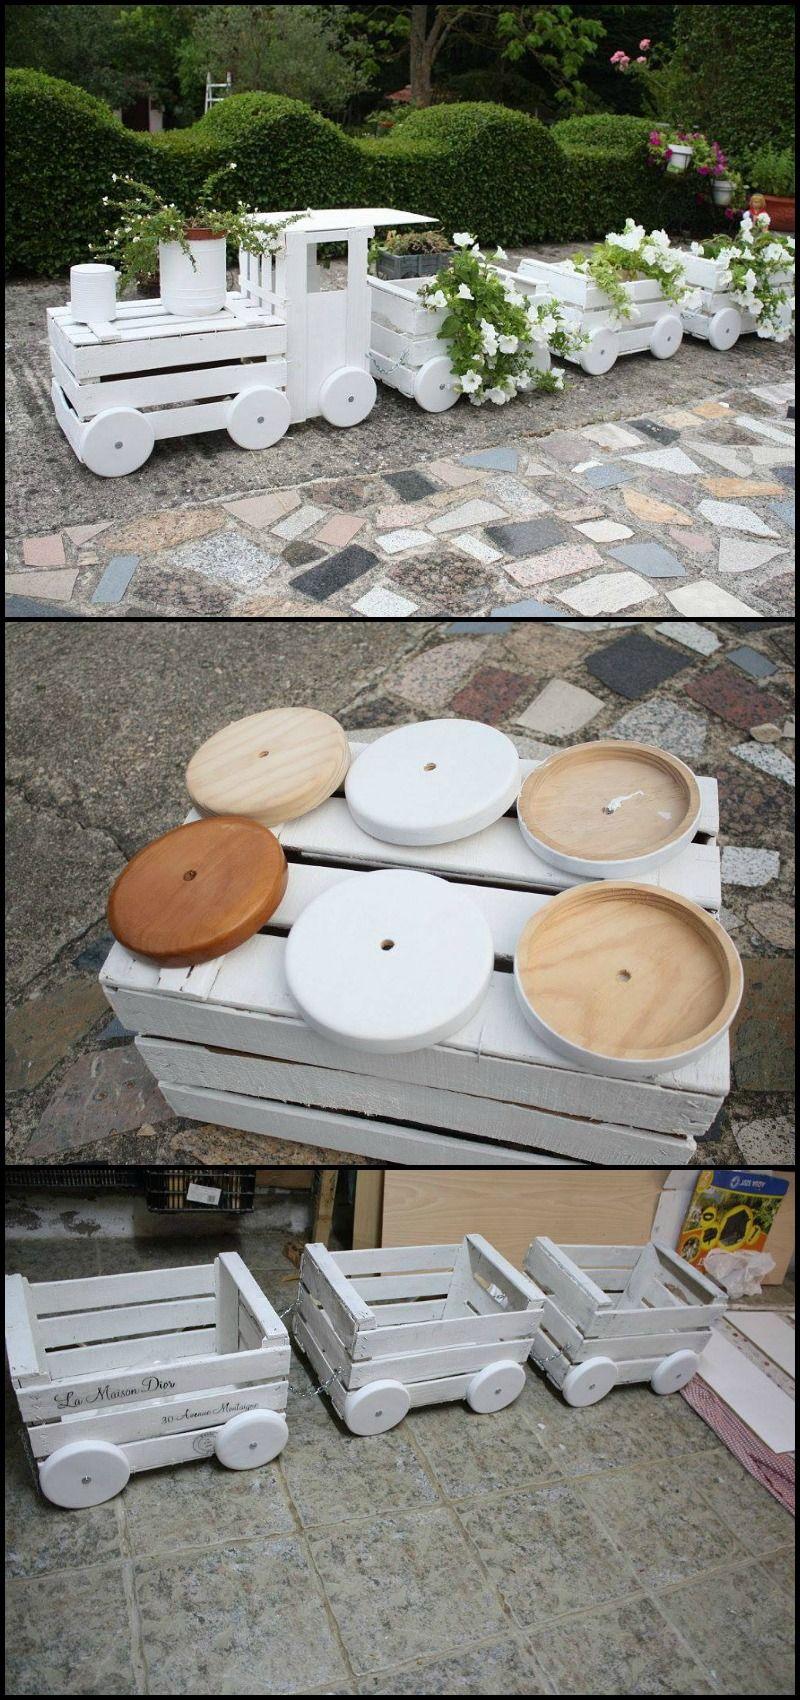 Transform old crates into a train planter gardens planters and head to - Garten bastelideen ...